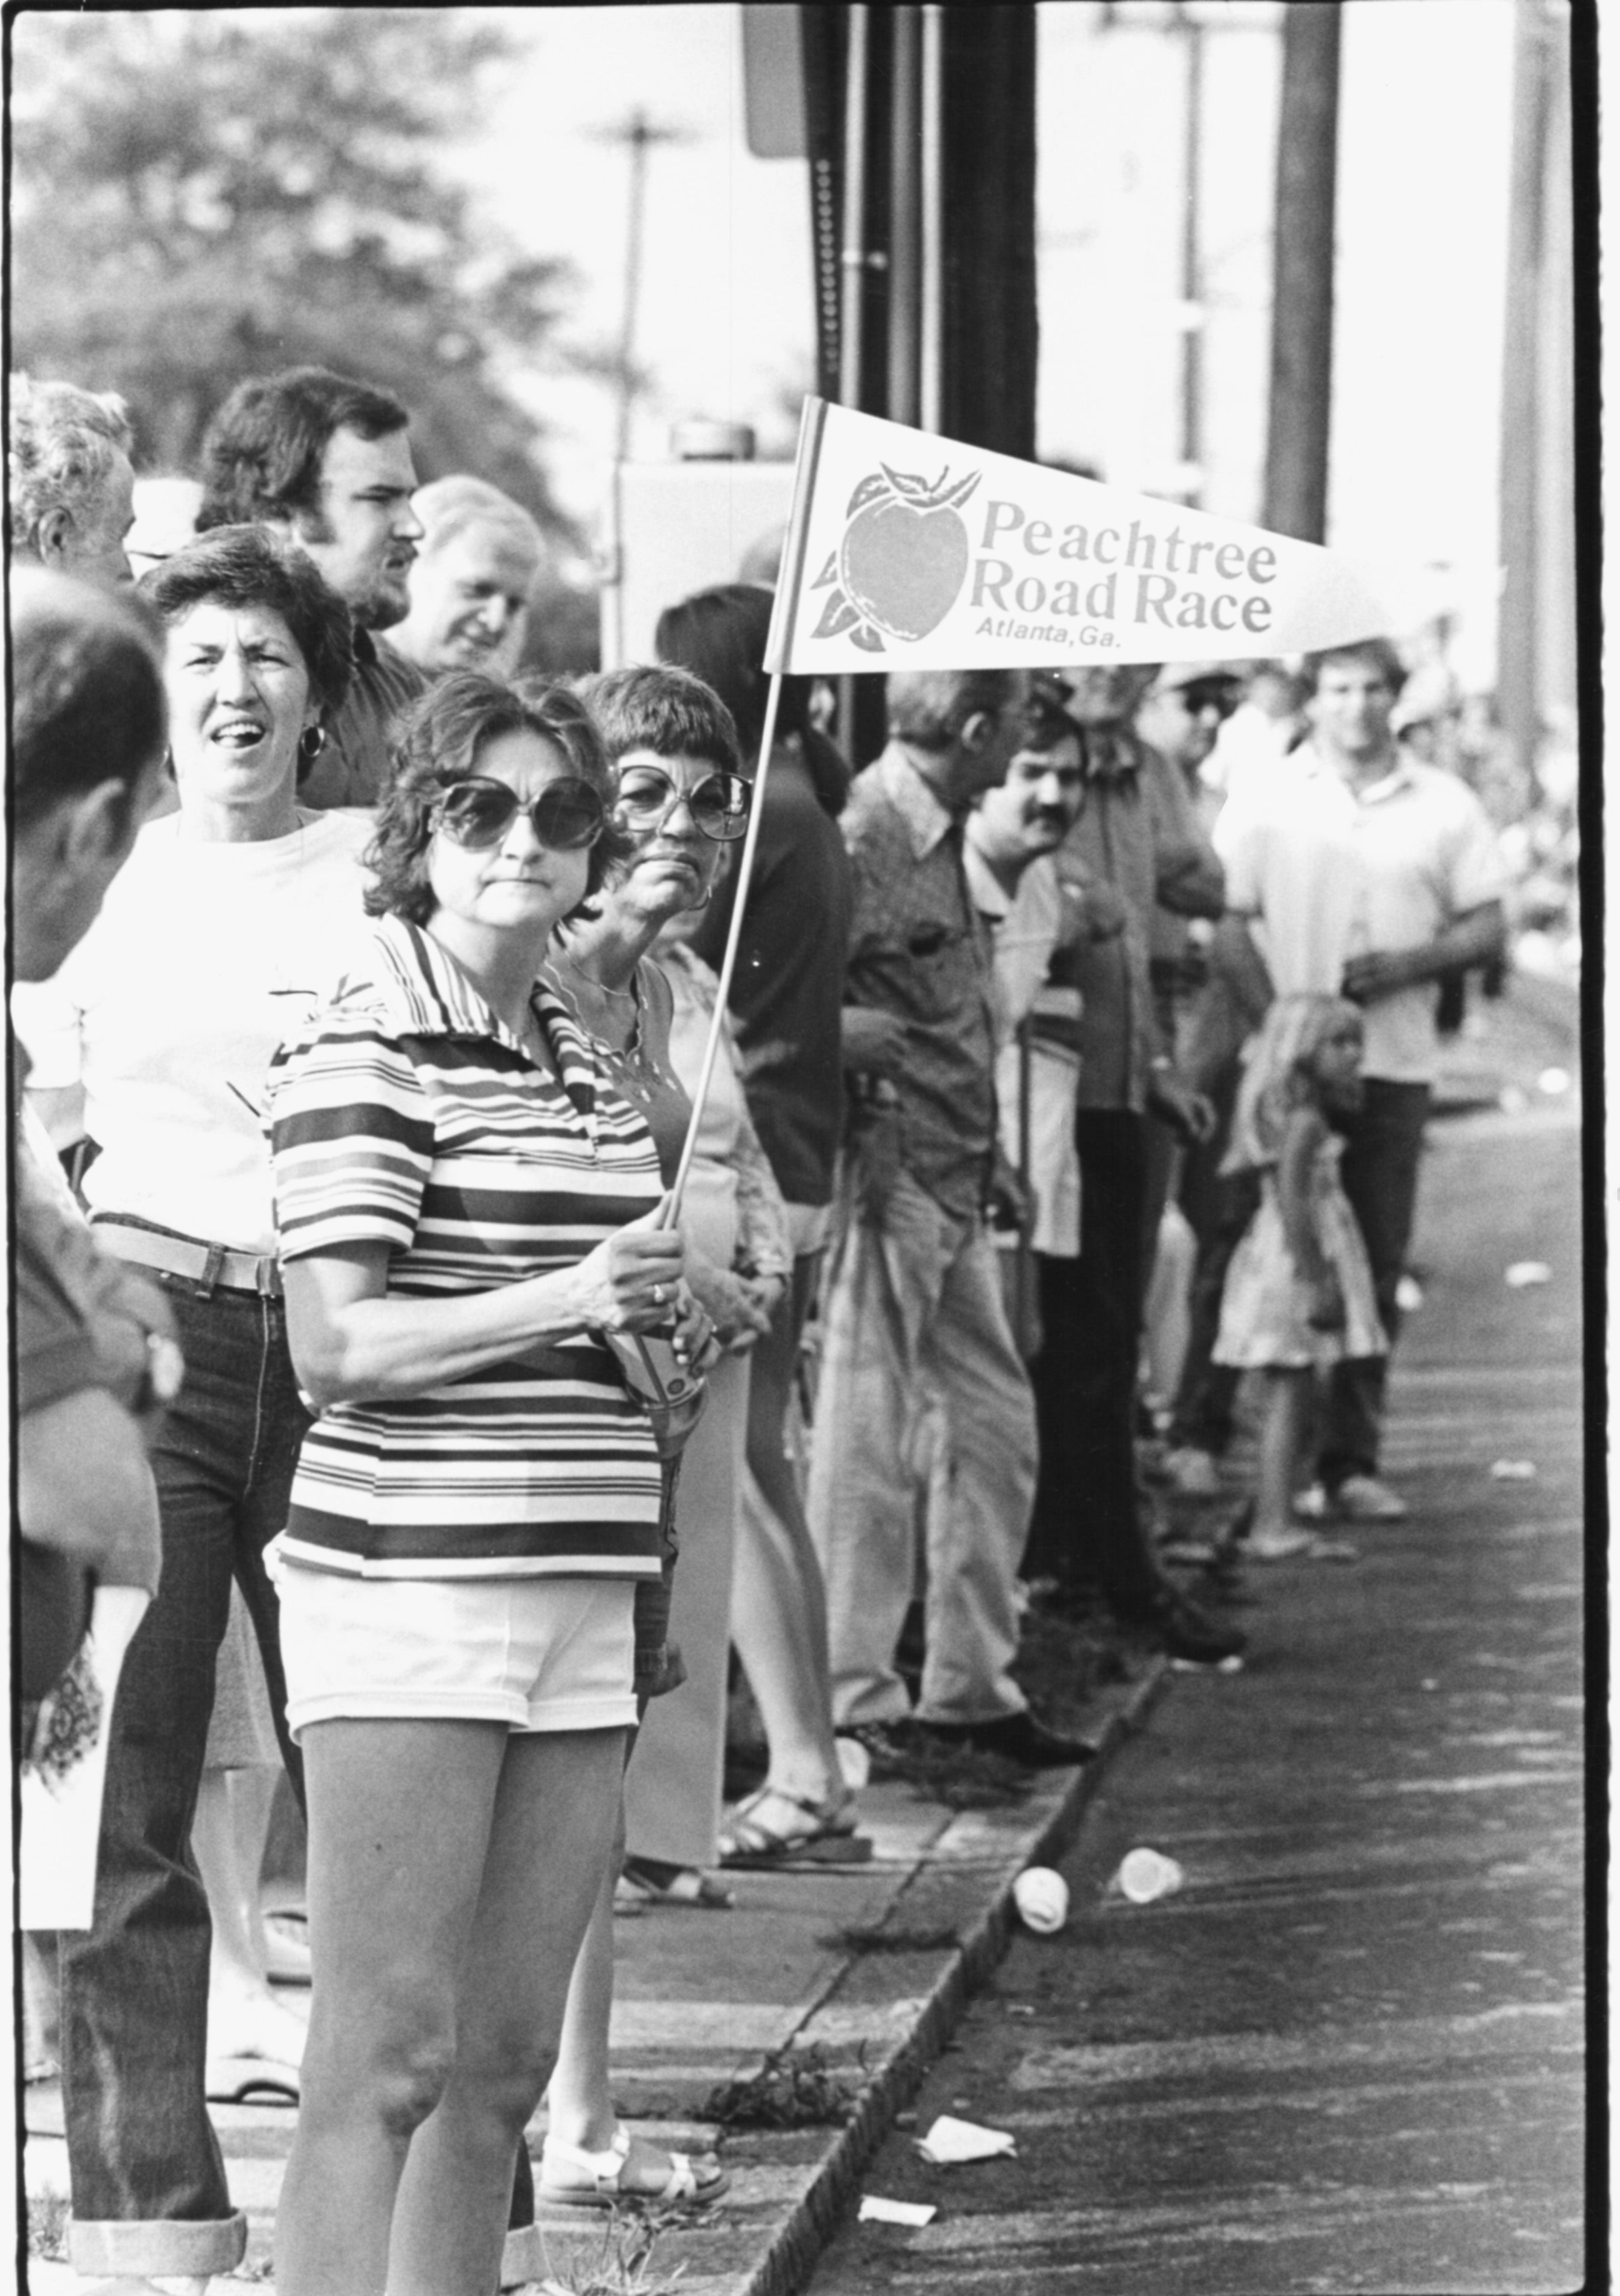 Peachtree Road Race spectators 1978